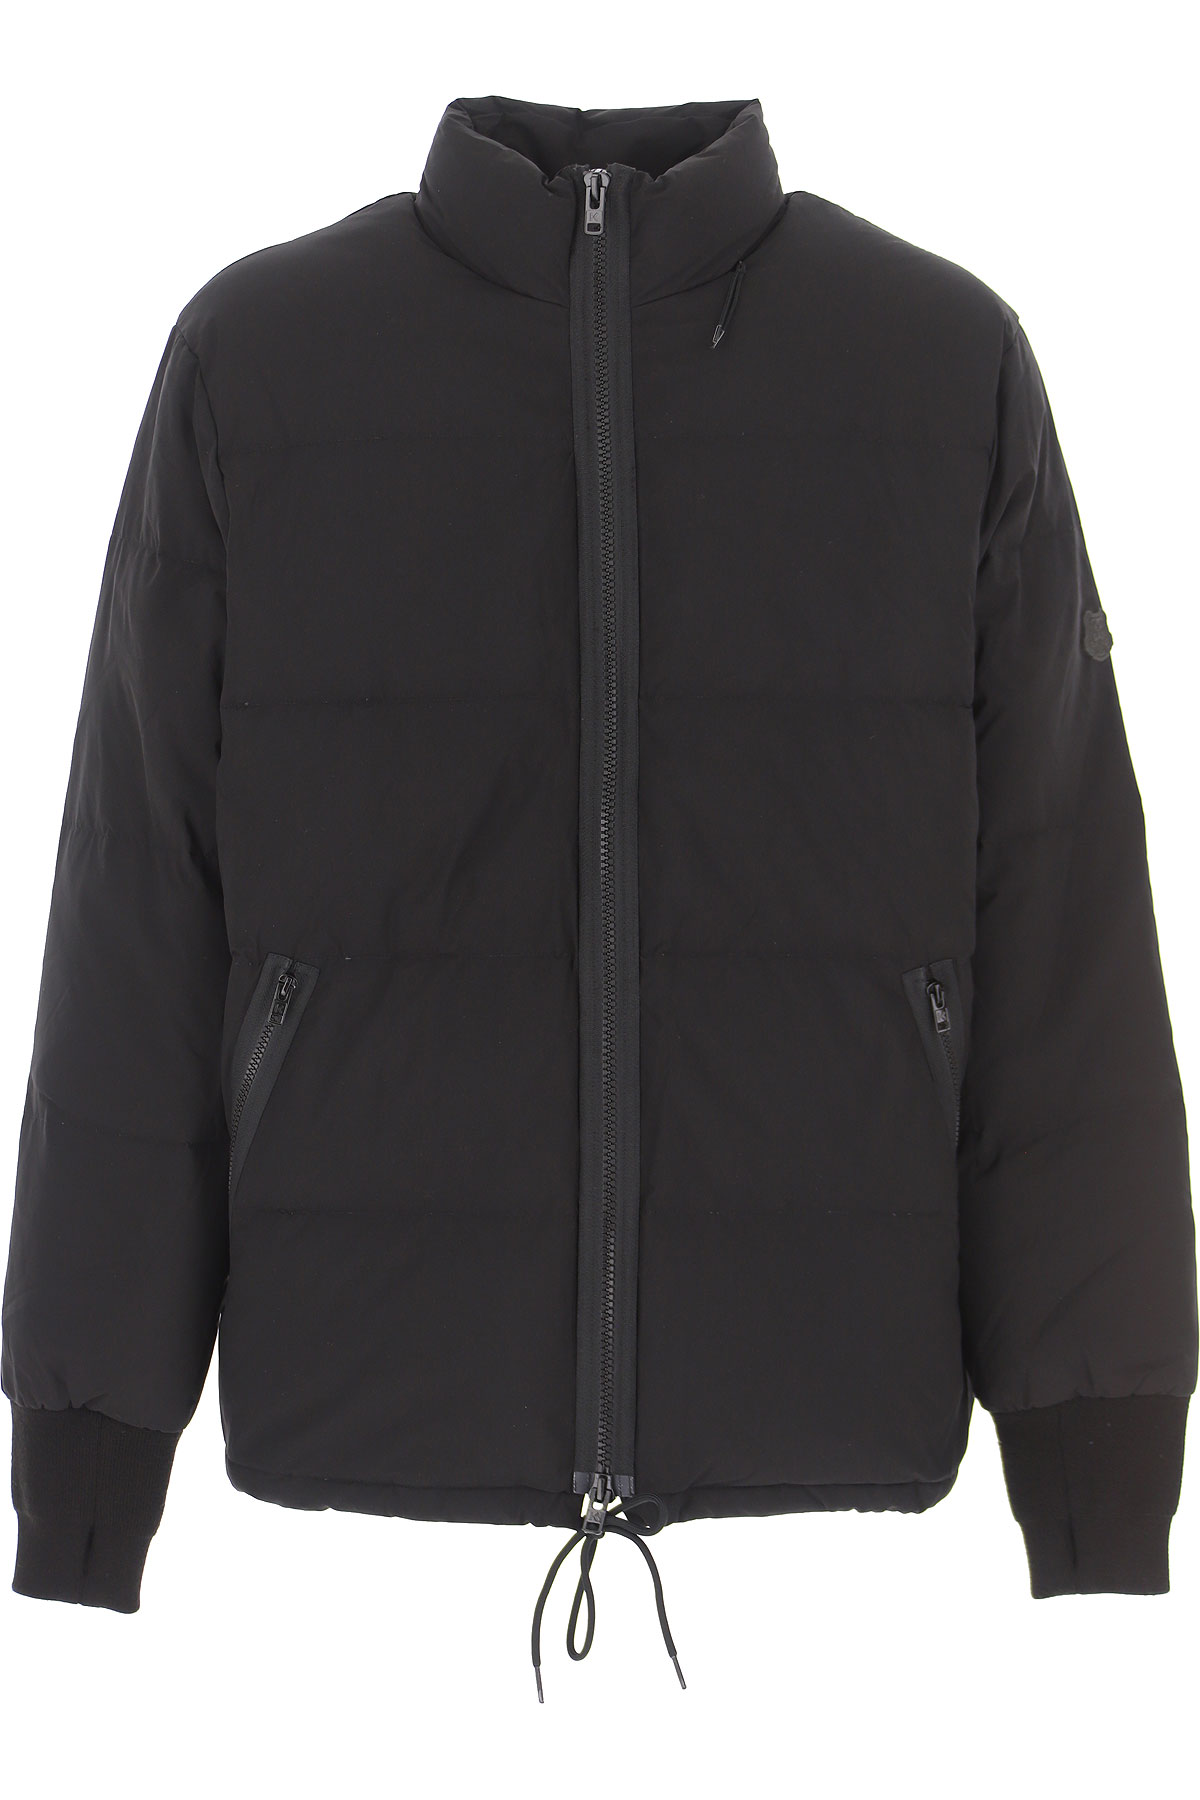 Kenzo Down Jacket for Men, Puffer Ski Jacket On Sale, Black, polyester, 2019, L M S